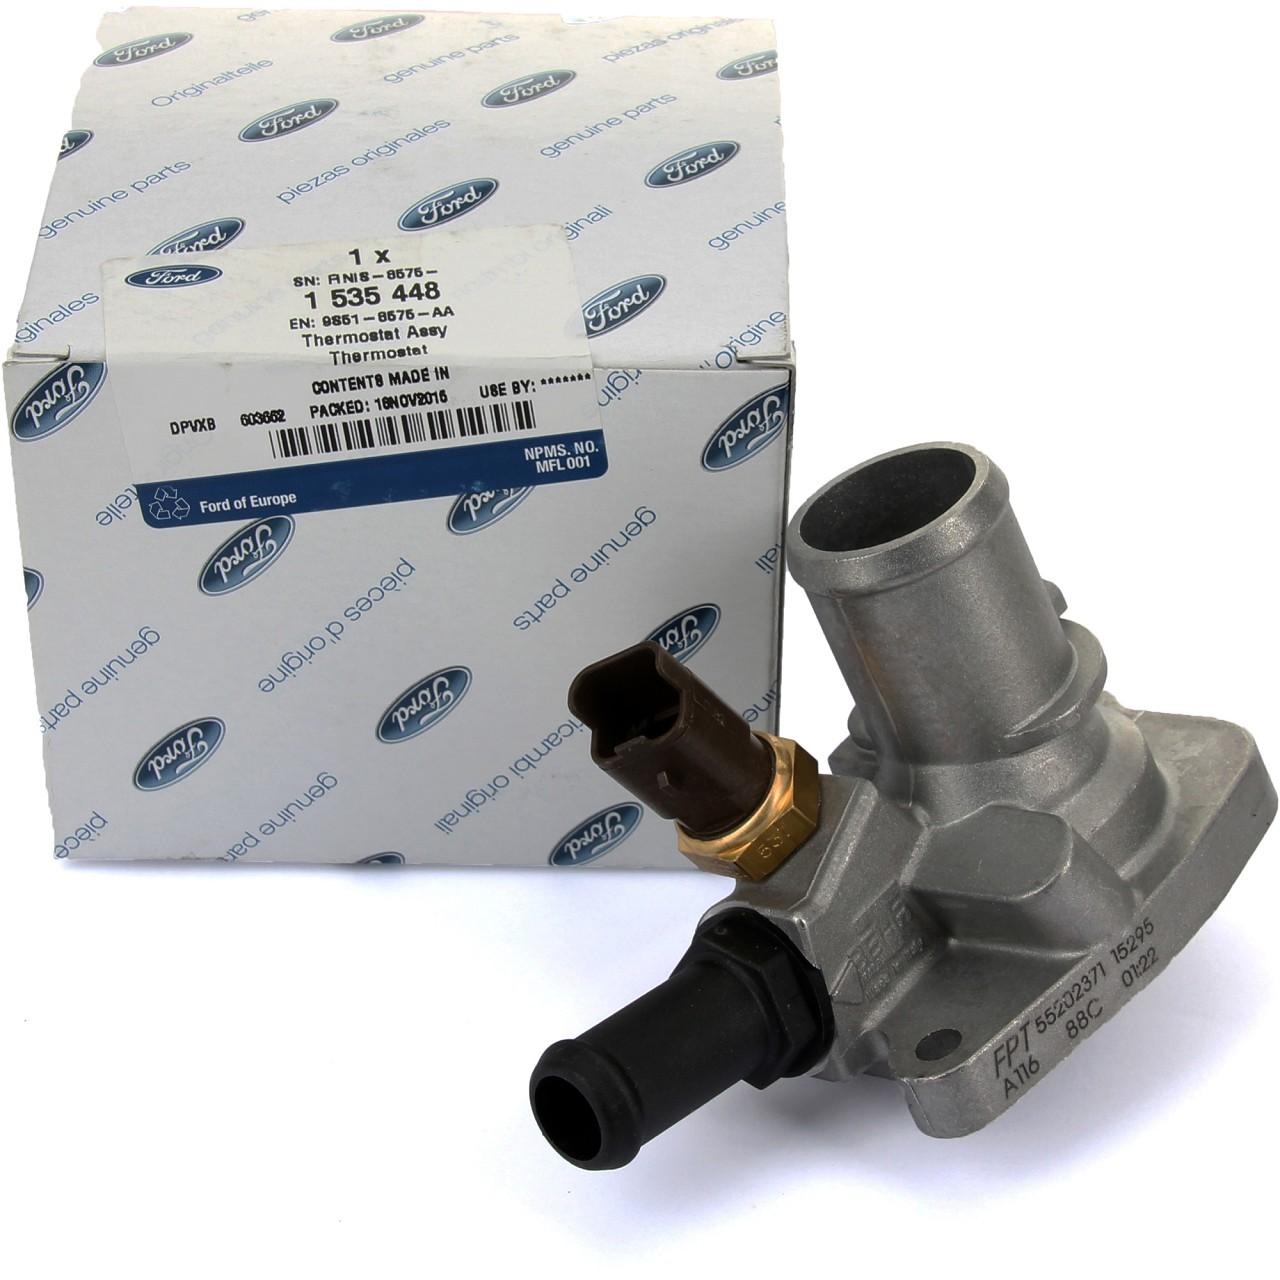 ORIGINAL Ford Thermostat Kühlmittelthermostat KA (RU8) 1.2 69 PS 1535448